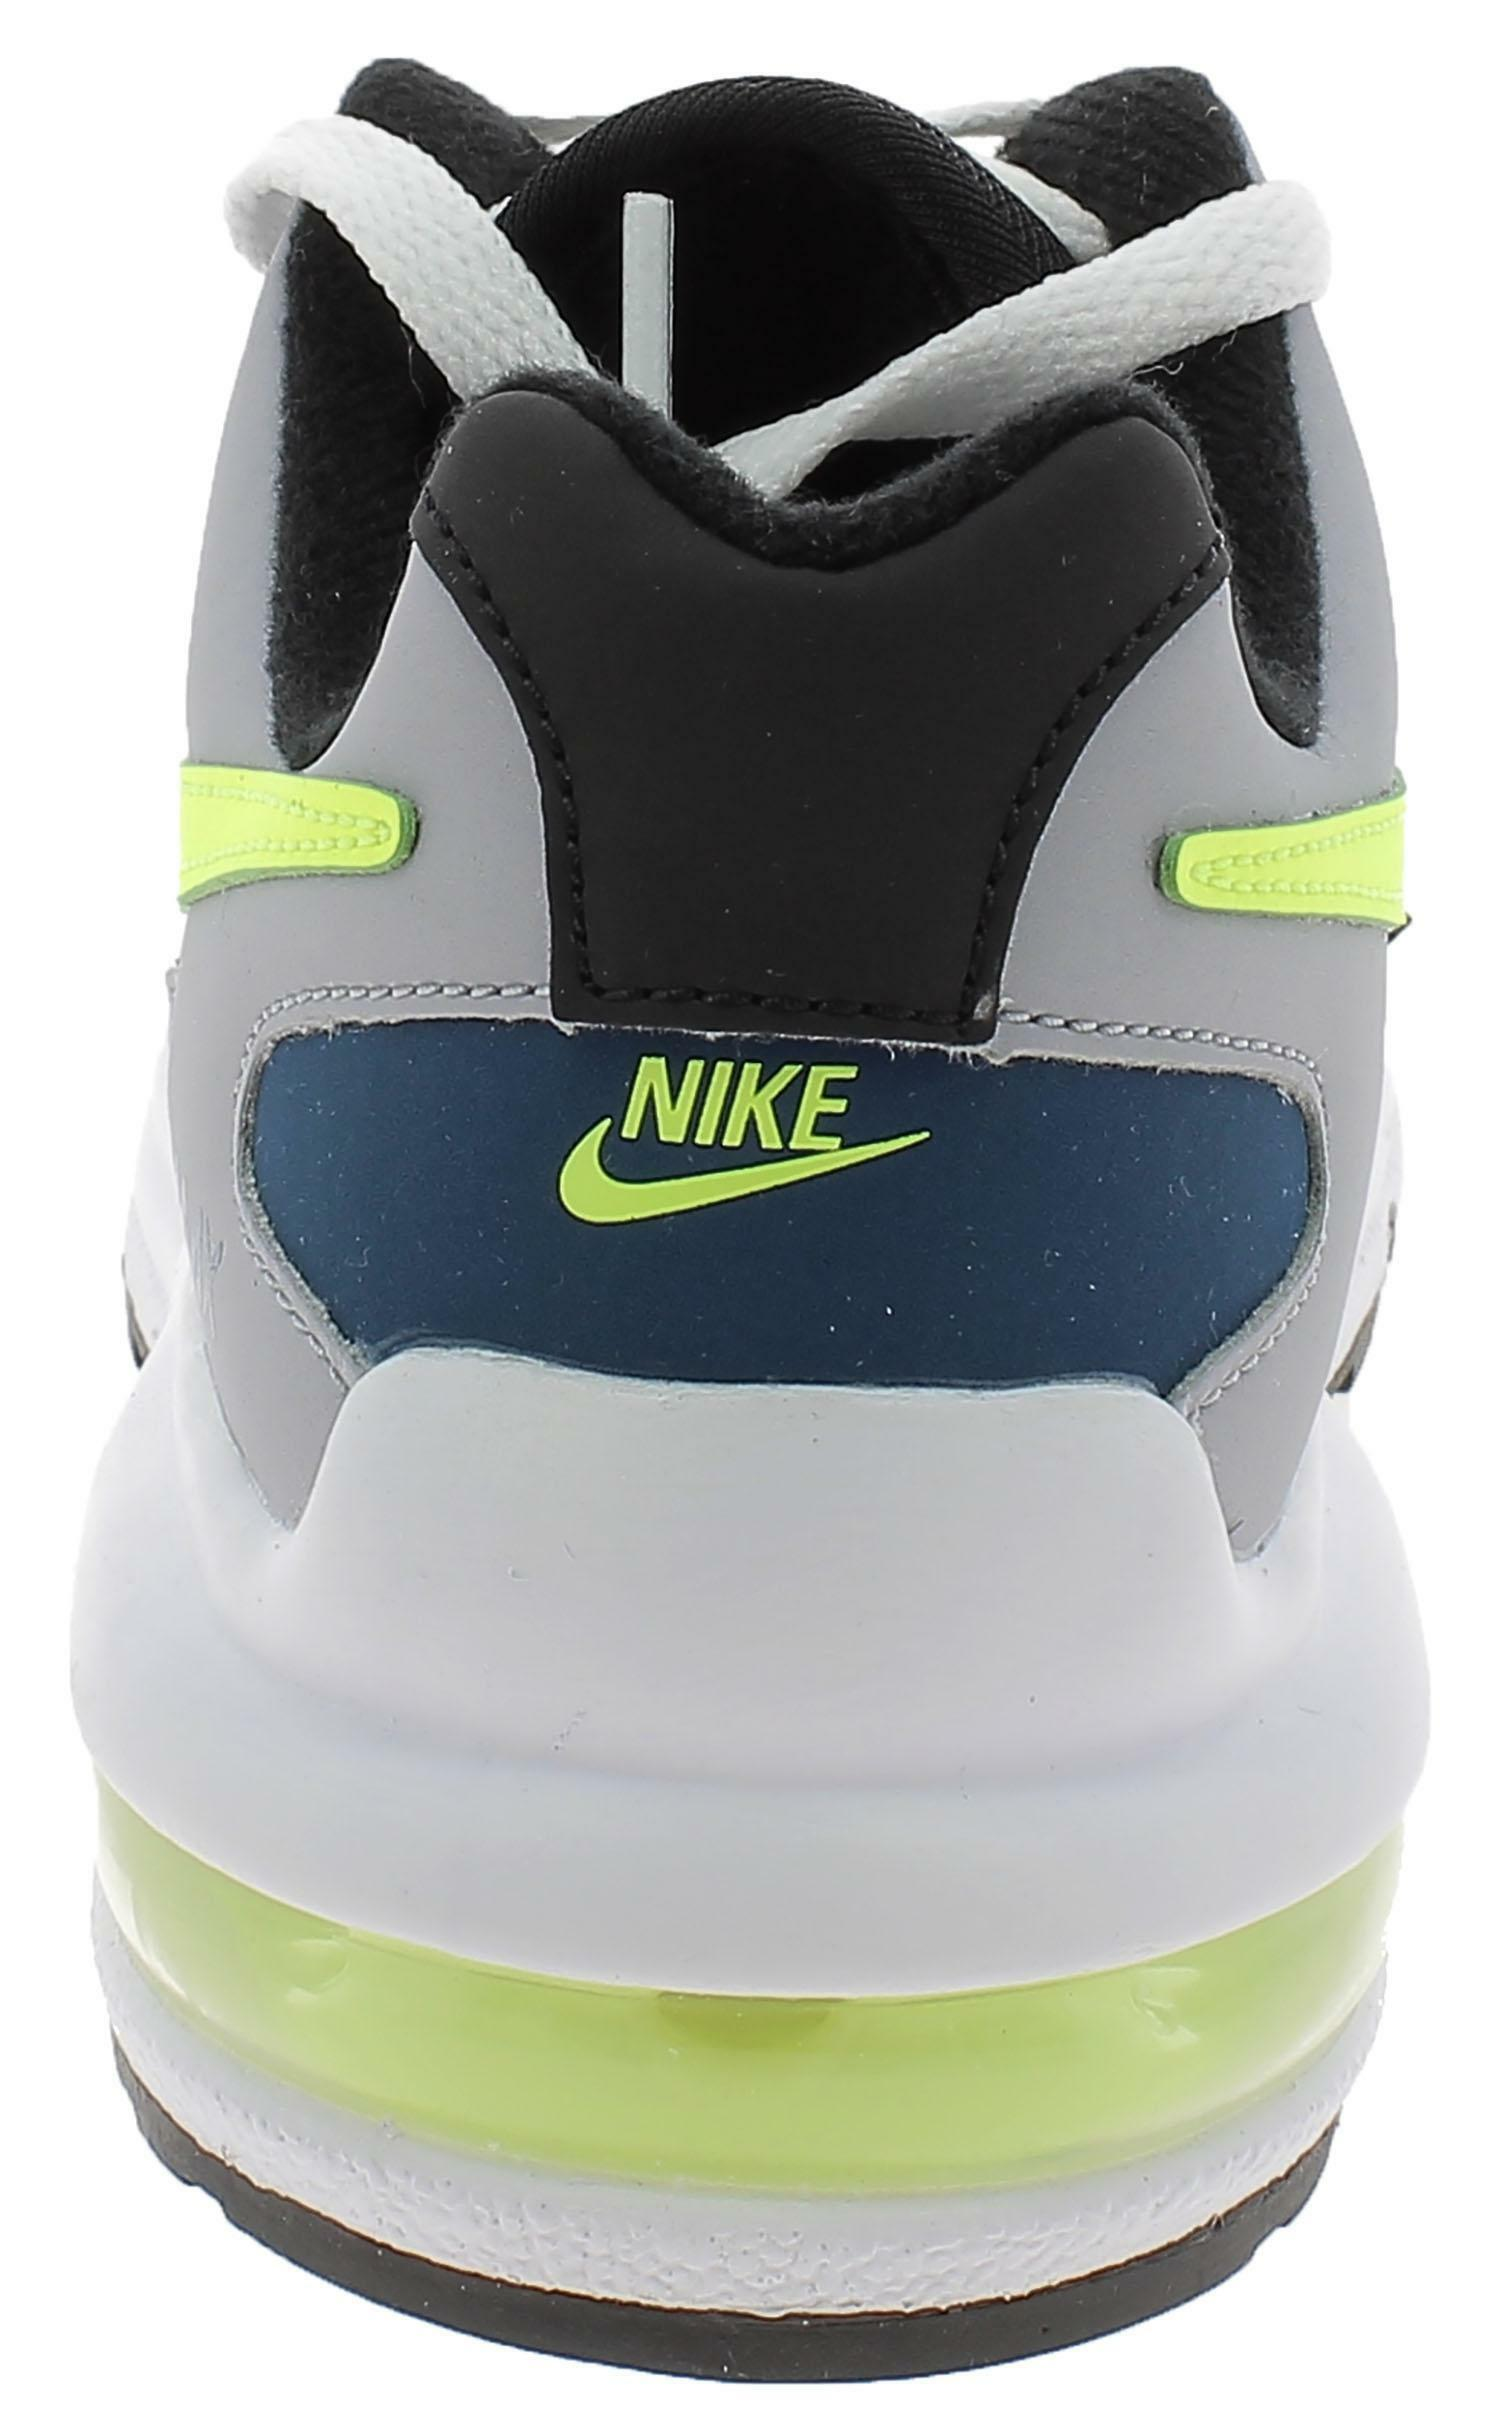 Nike air max wright gs scarpe sportive bambino bianche cz4192100